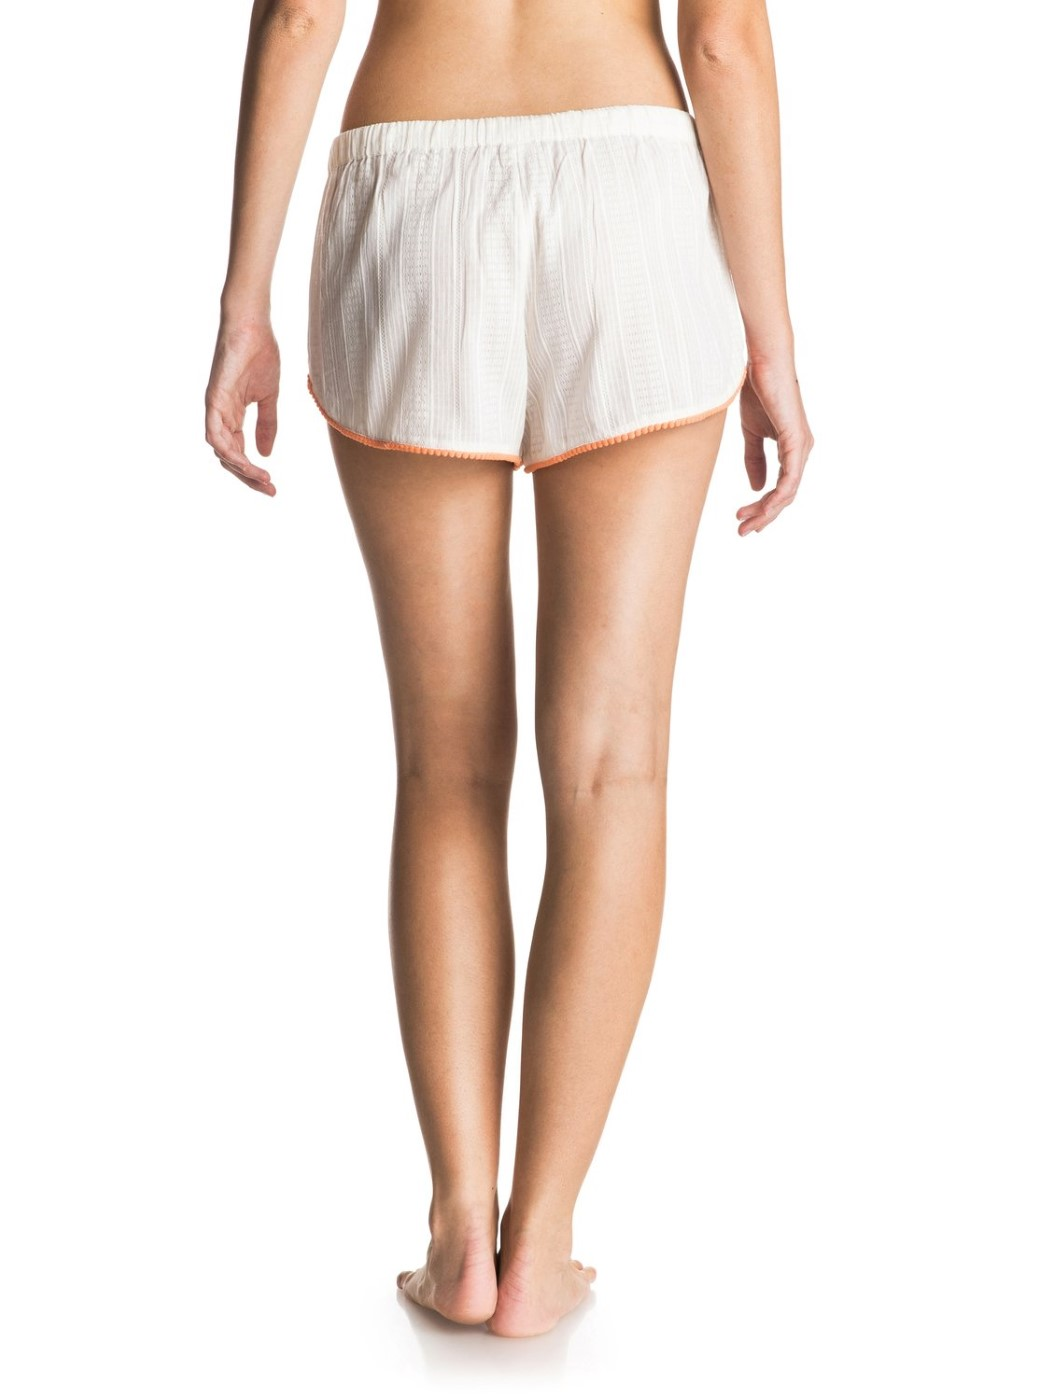 Roxy Womens Cut Pompom Beach Shorts ERJX603022